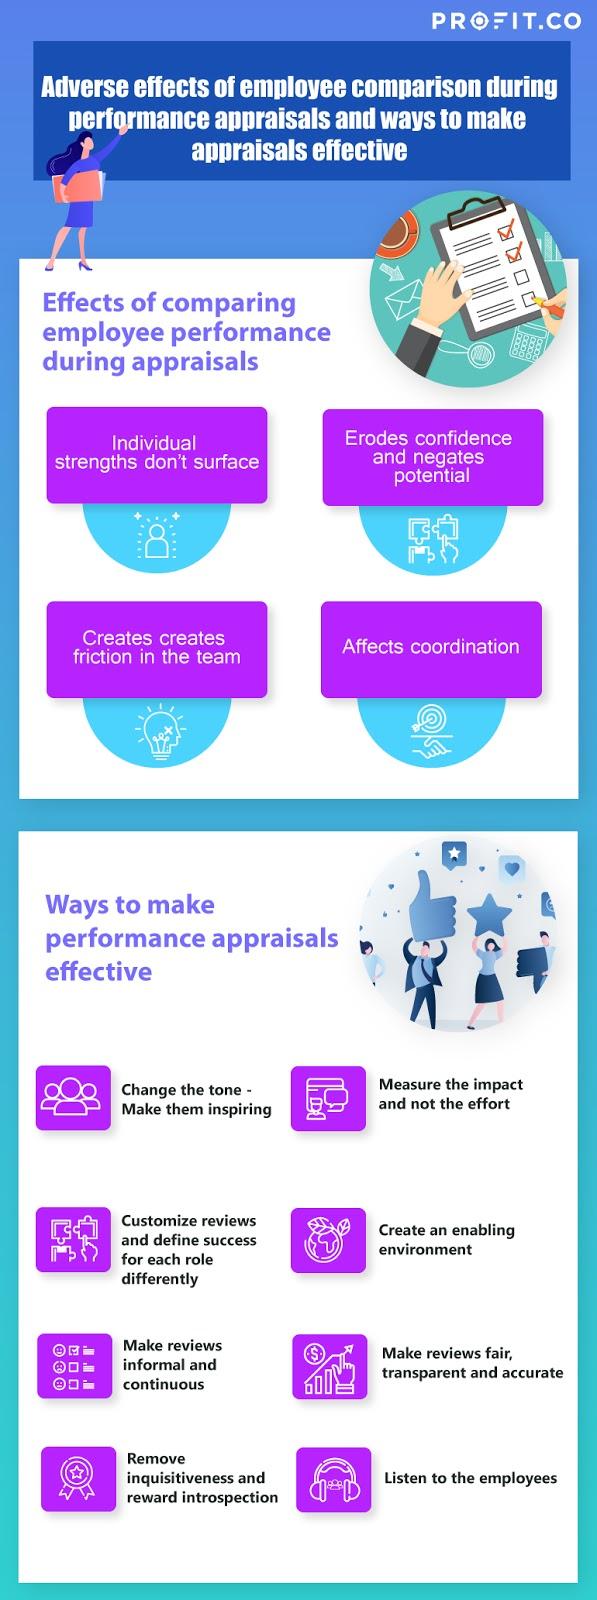 Effective Employee Comparison